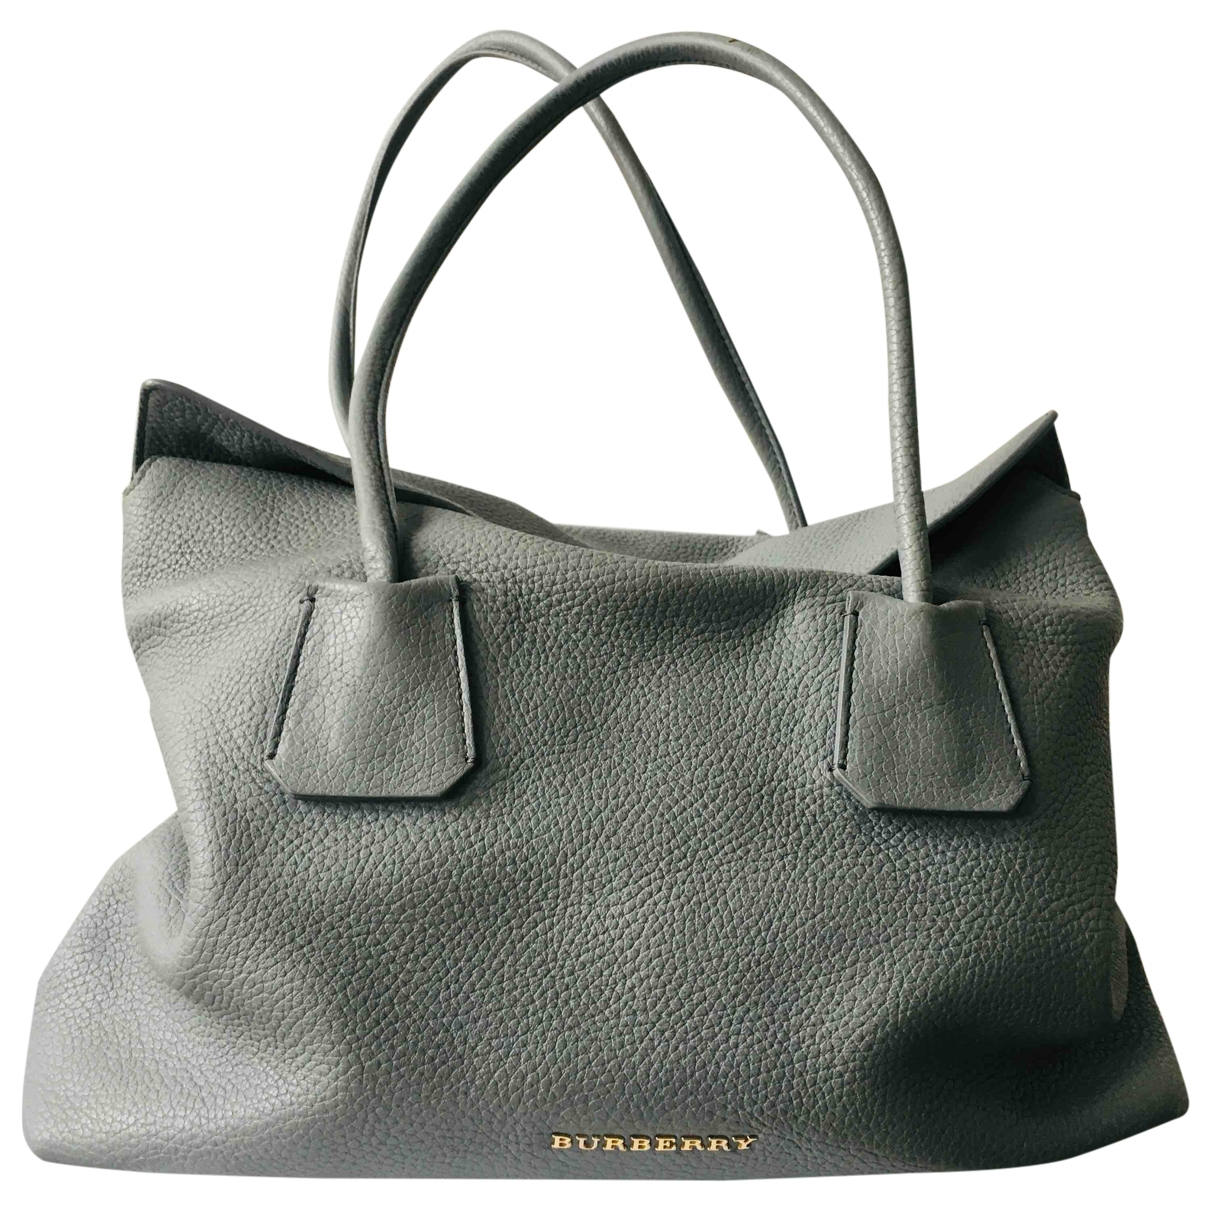 Burberry N Grey Leather handbag for Women N